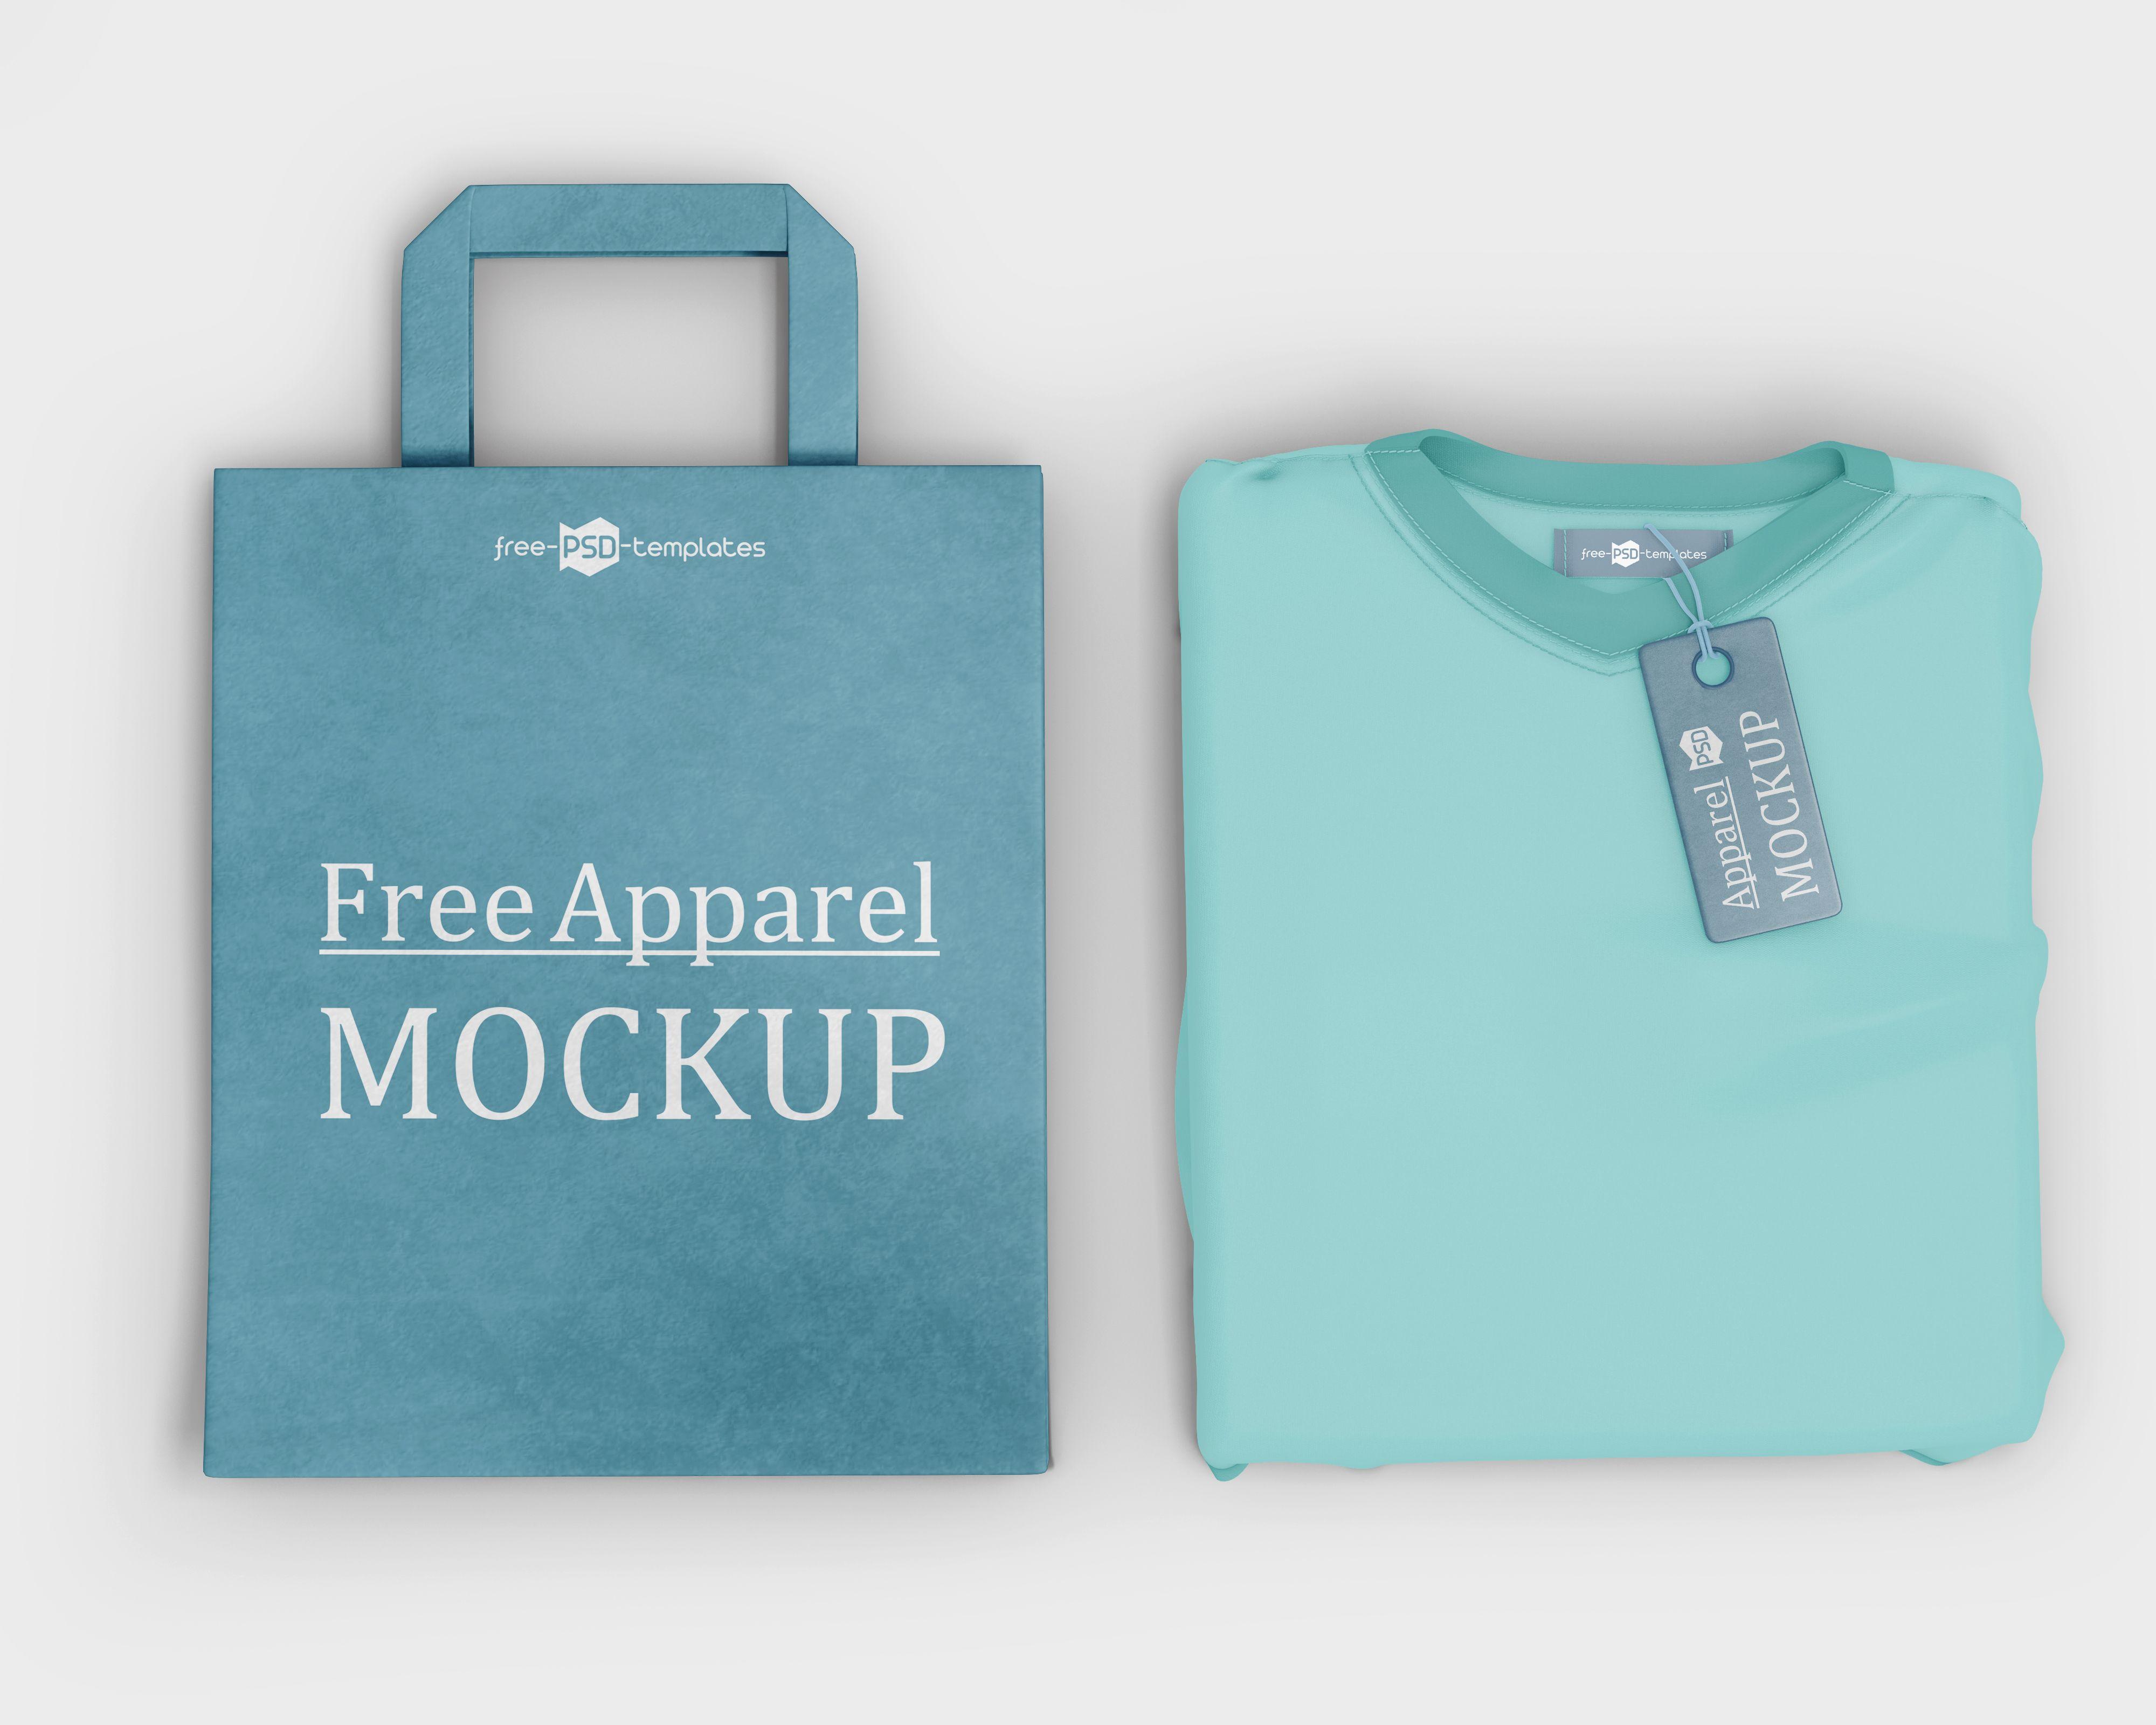 Download Free Apparel T Shirt Label Bag Mockup Mockup Free Psd Free Mockup Bag Mockup